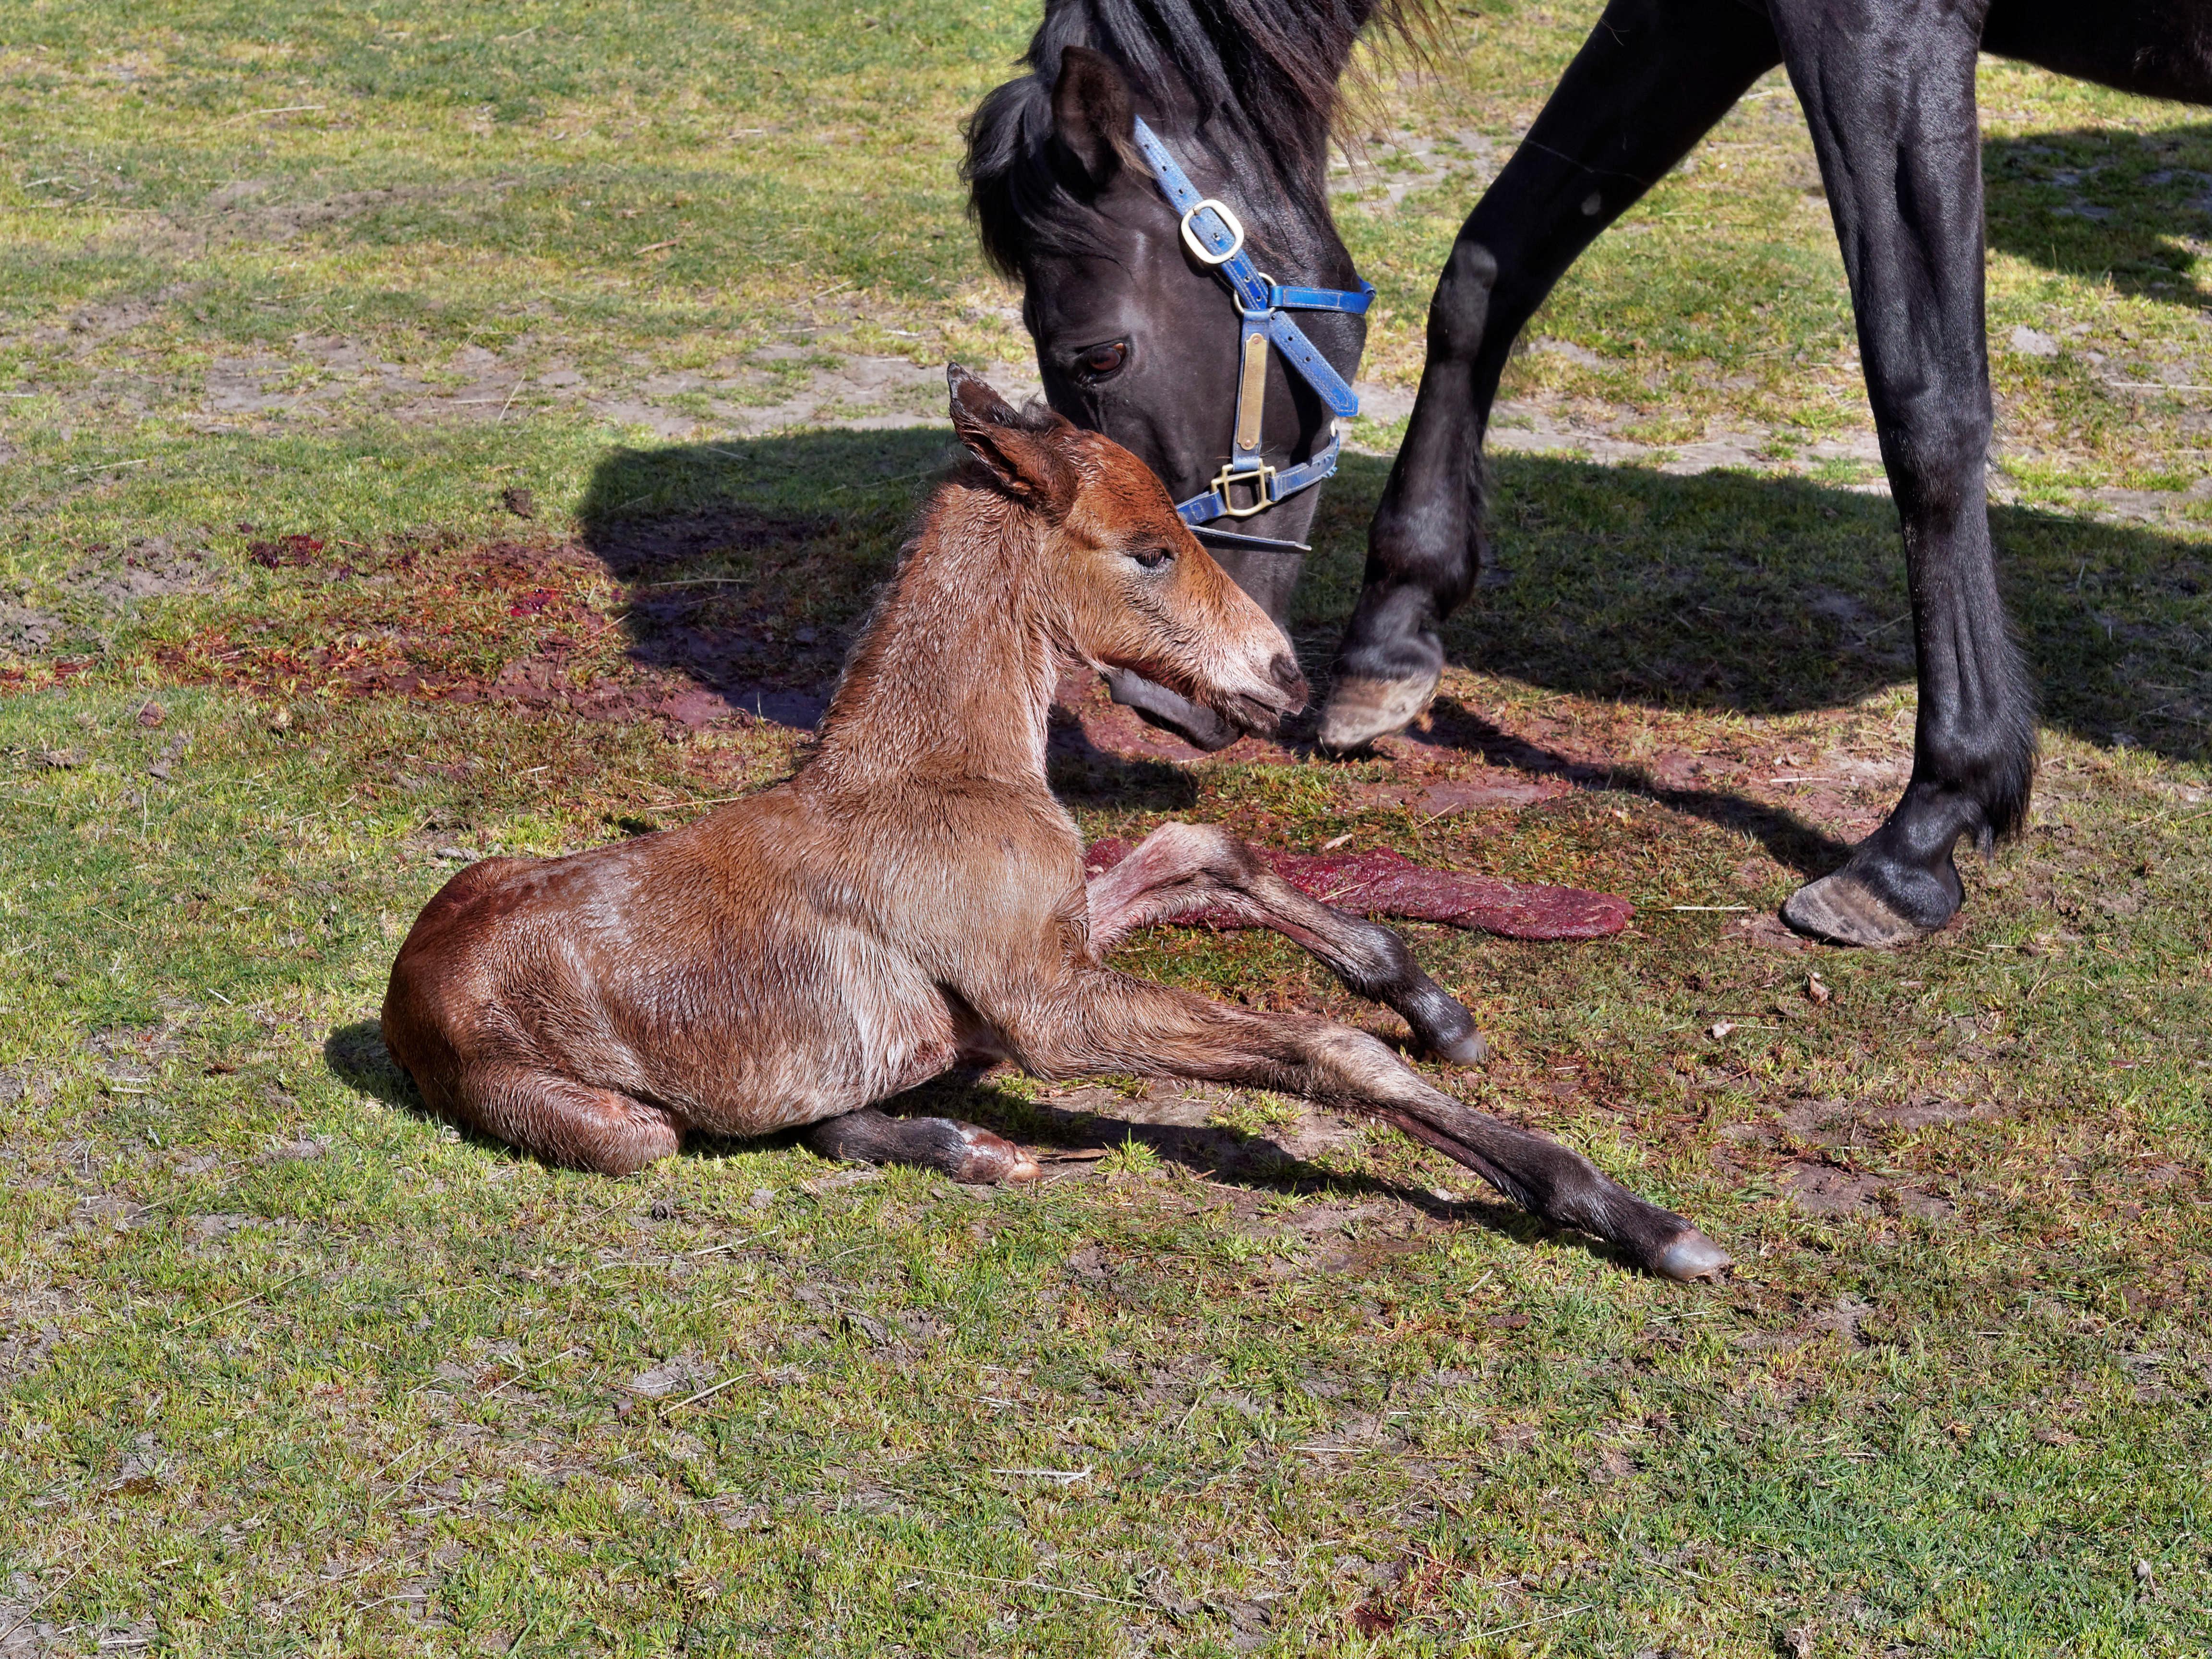 New-foal-7.jpeg